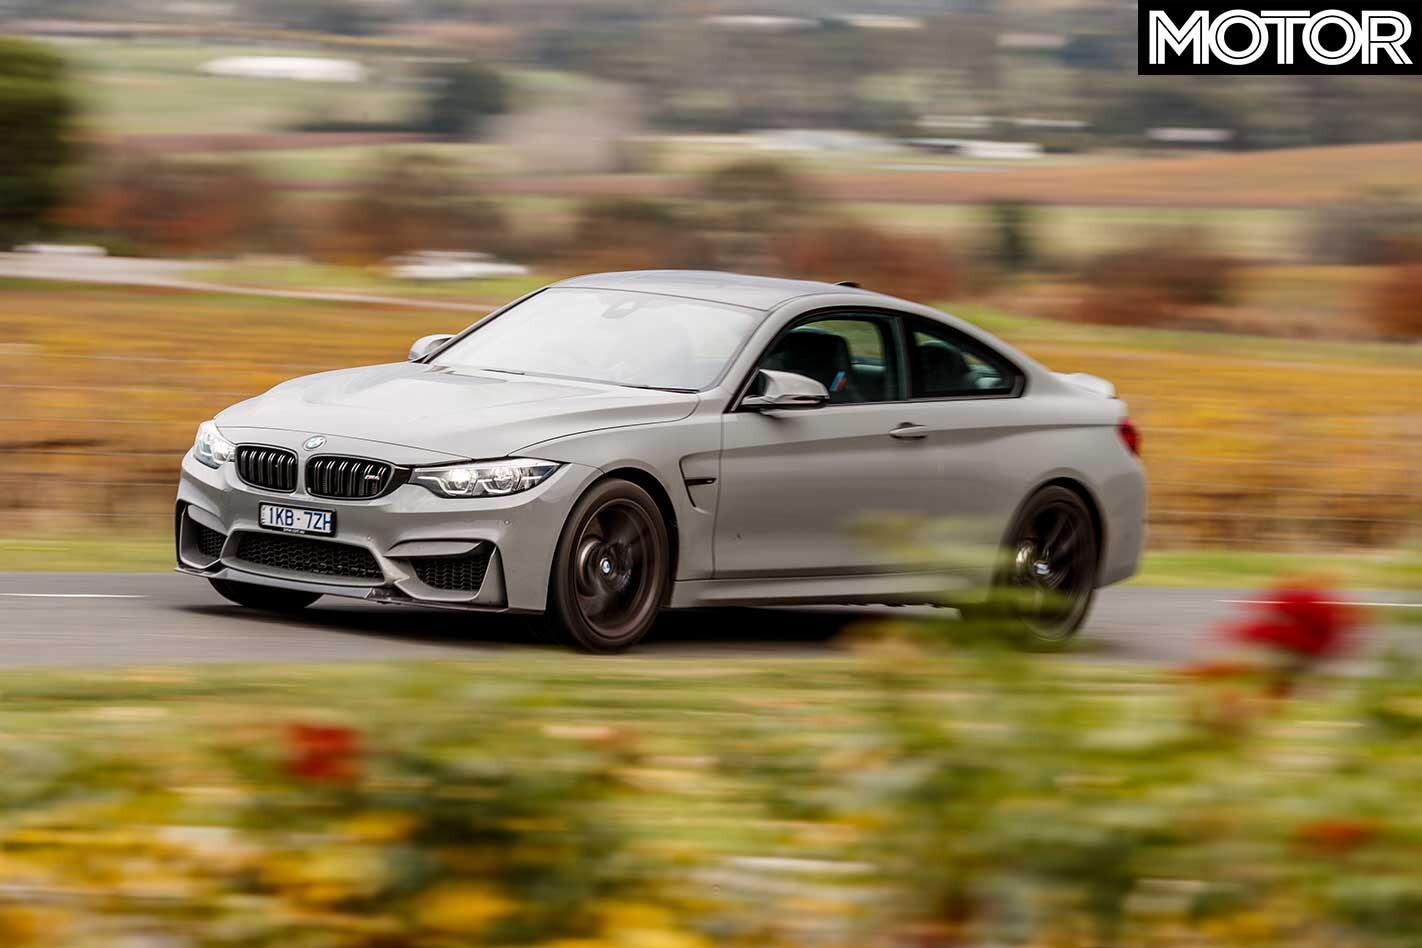 2018 BMW M 4 CS Front Performance Jpg